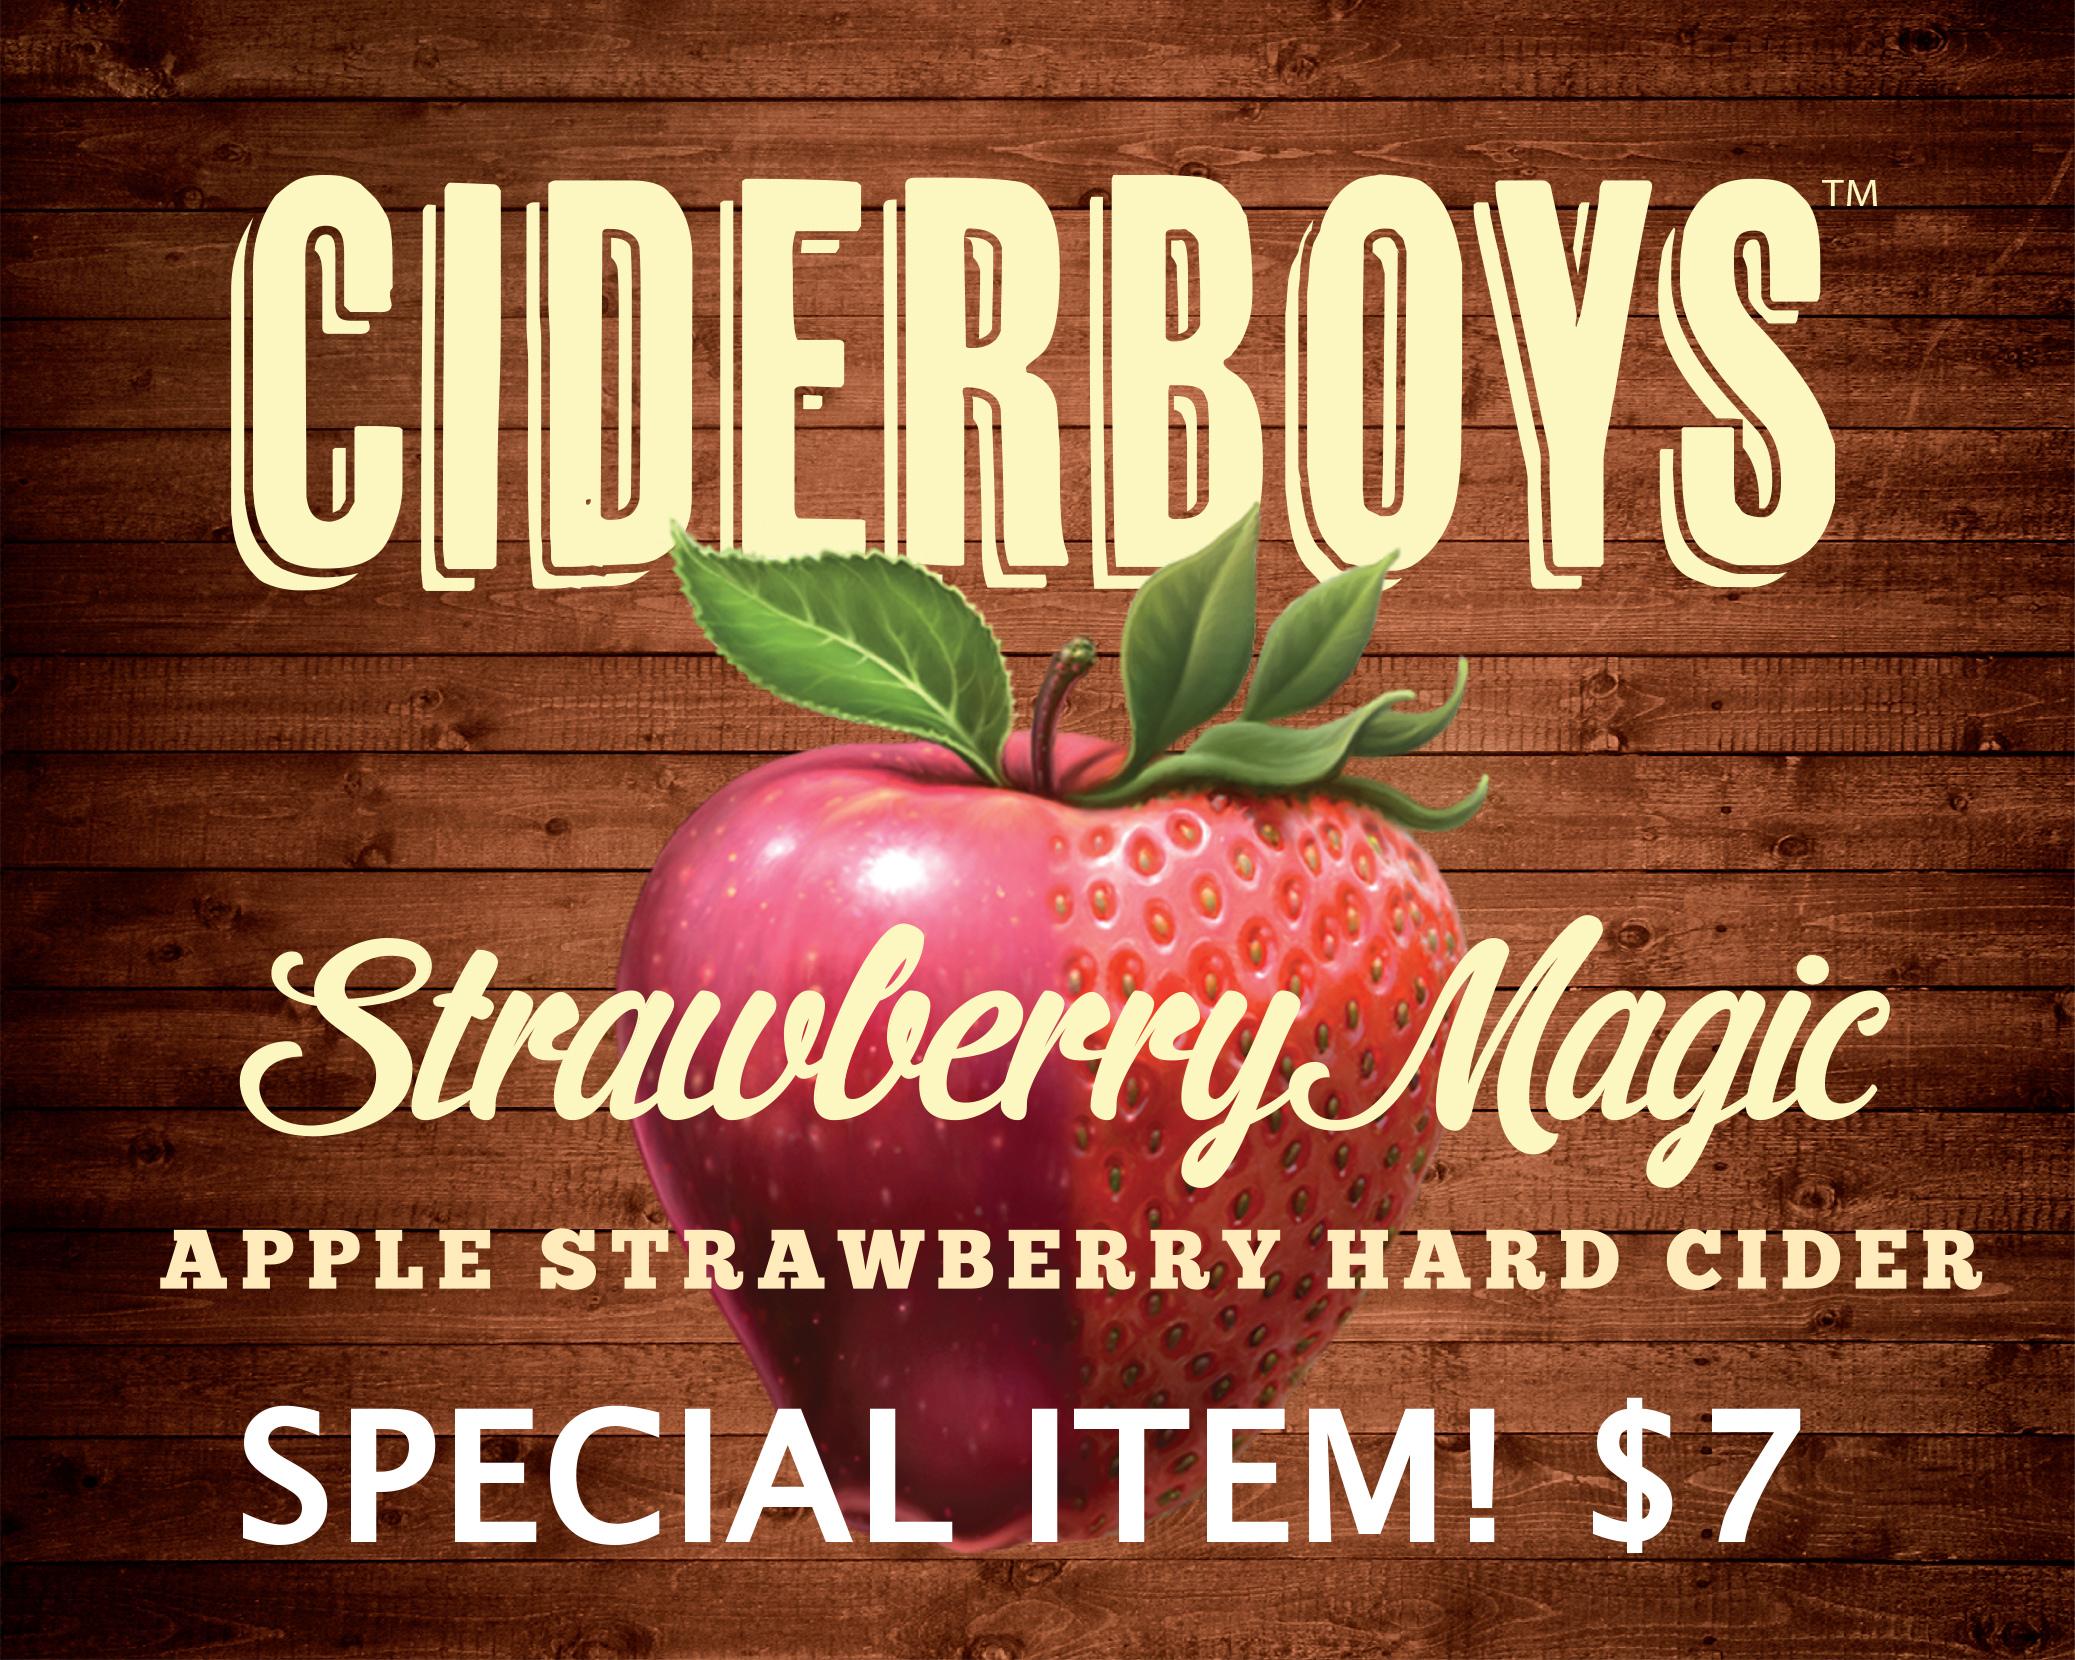 Ciderboys Strawberry Magic 7 bucks.jpg